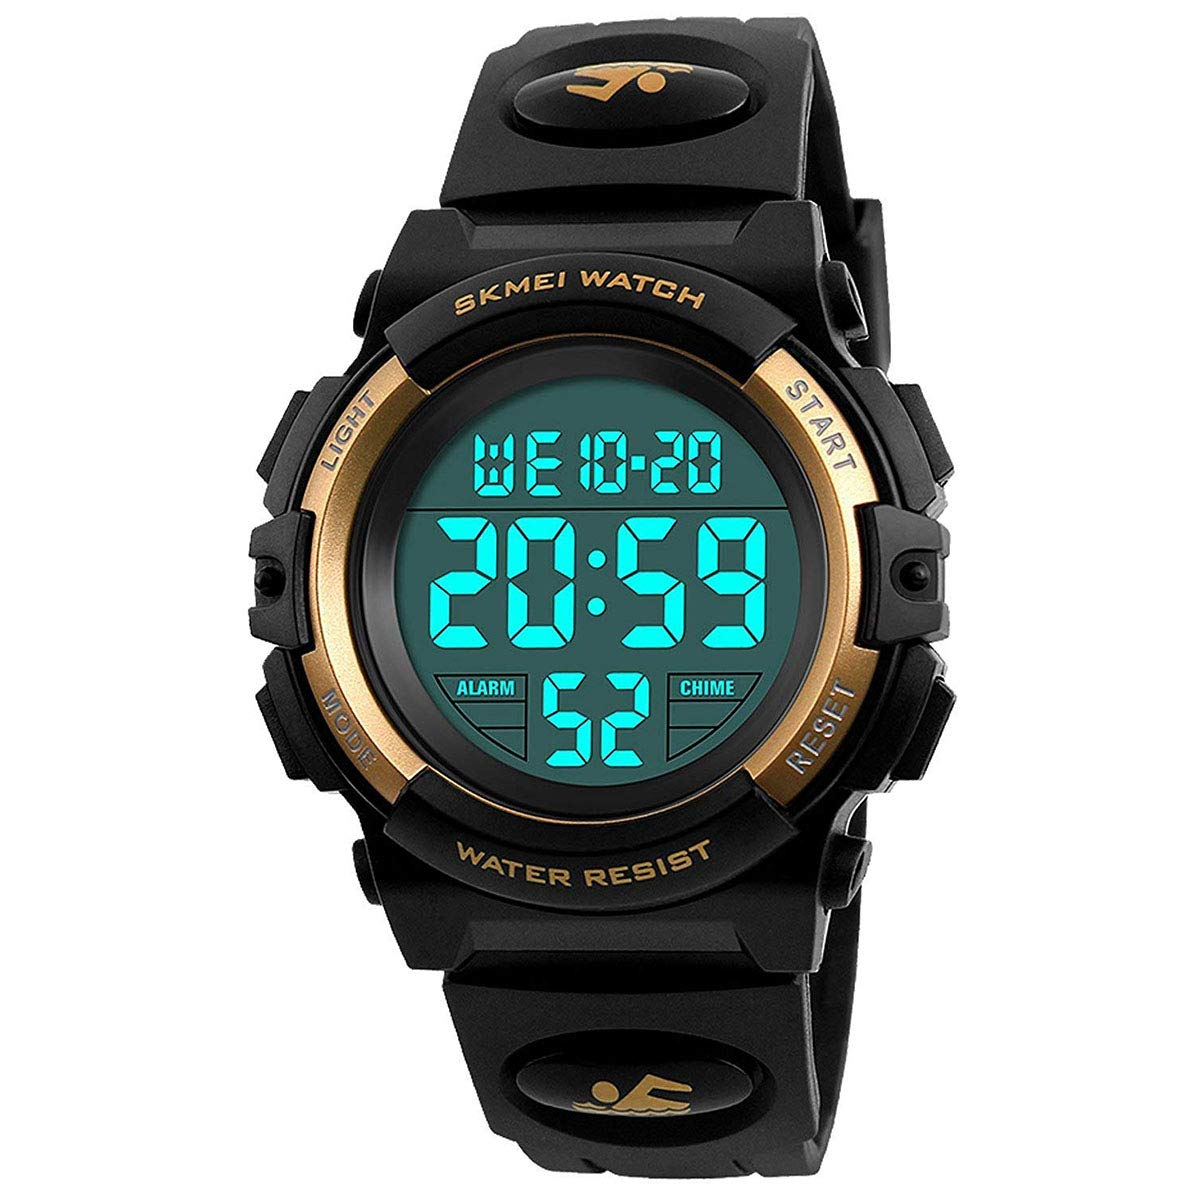 Kids Digital Watch for Boys Girls Waterproof Sport Watches with Alarm Stopwatch Electronic Analog Quartz Led Wrist Watch Children Gifts 1266